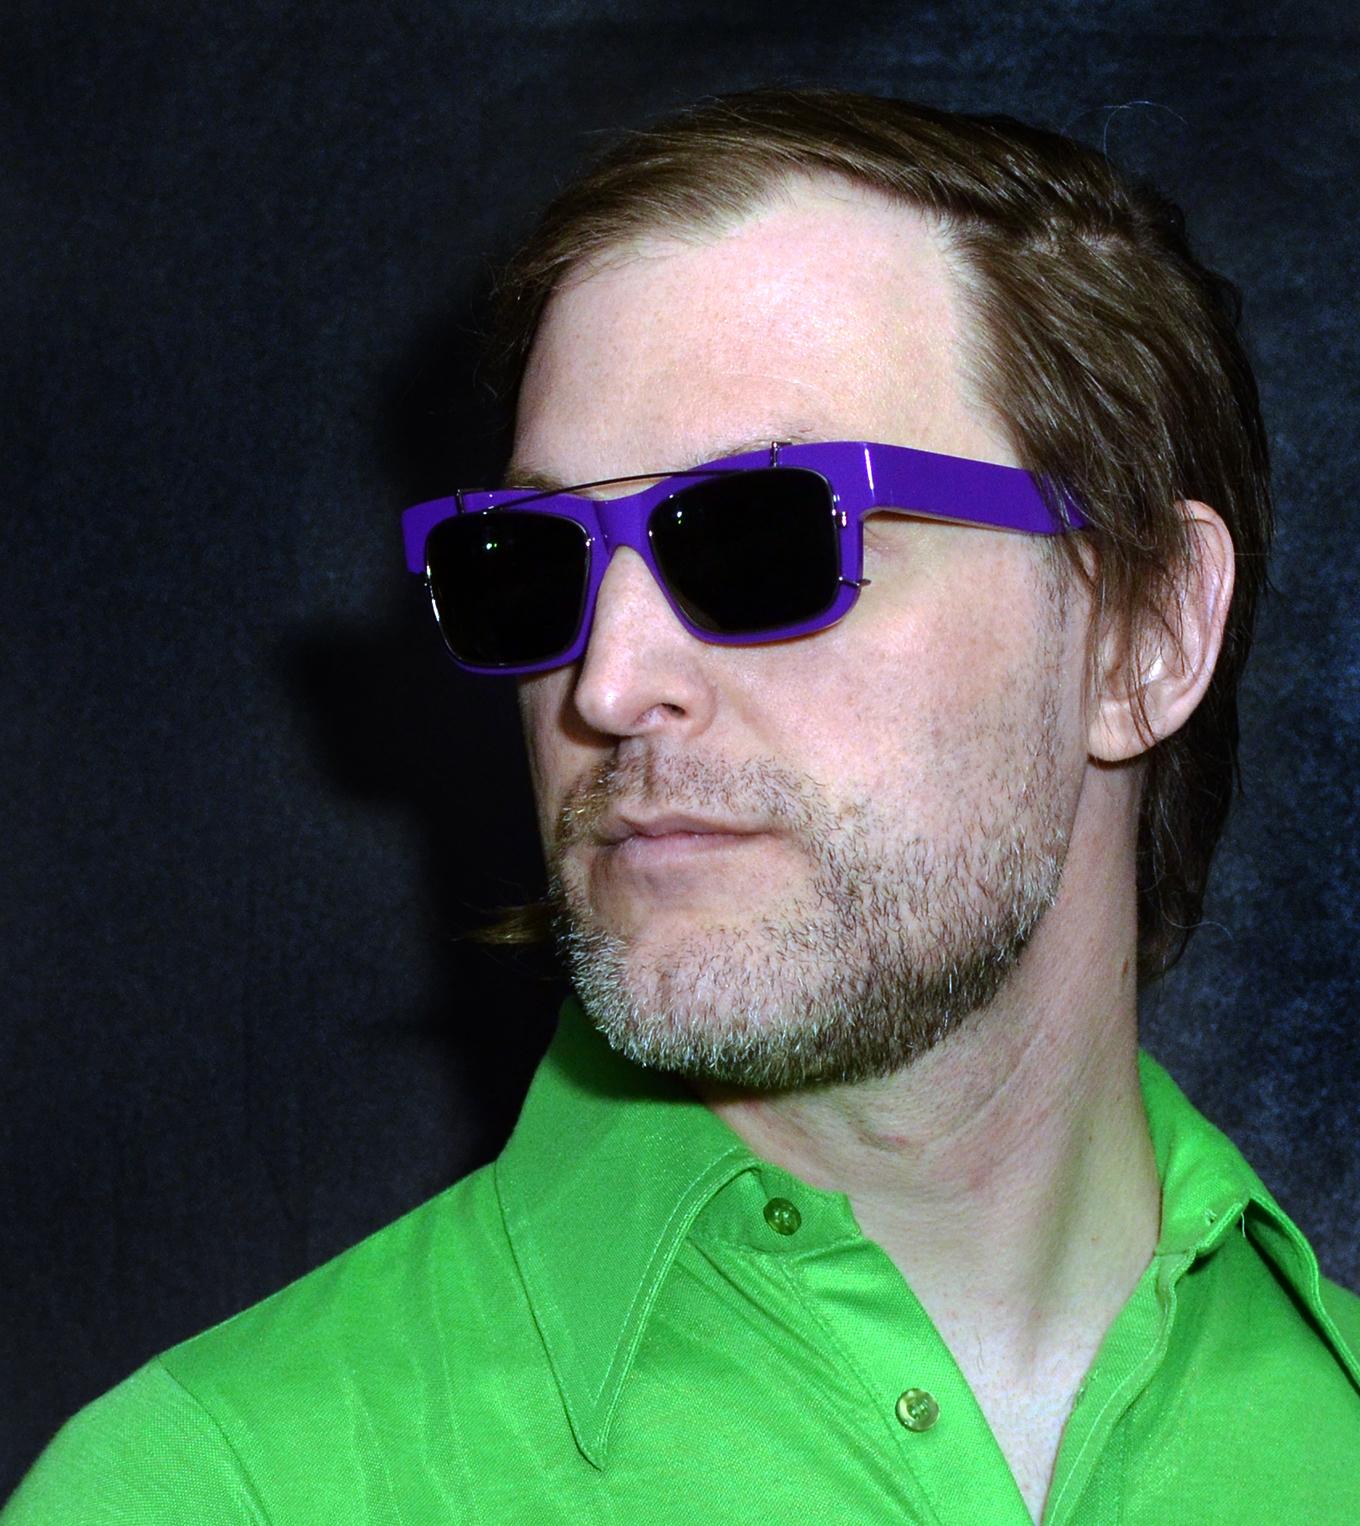 d-irpair-phantom-privacy-eyewear-sunglasses-ir.jpg